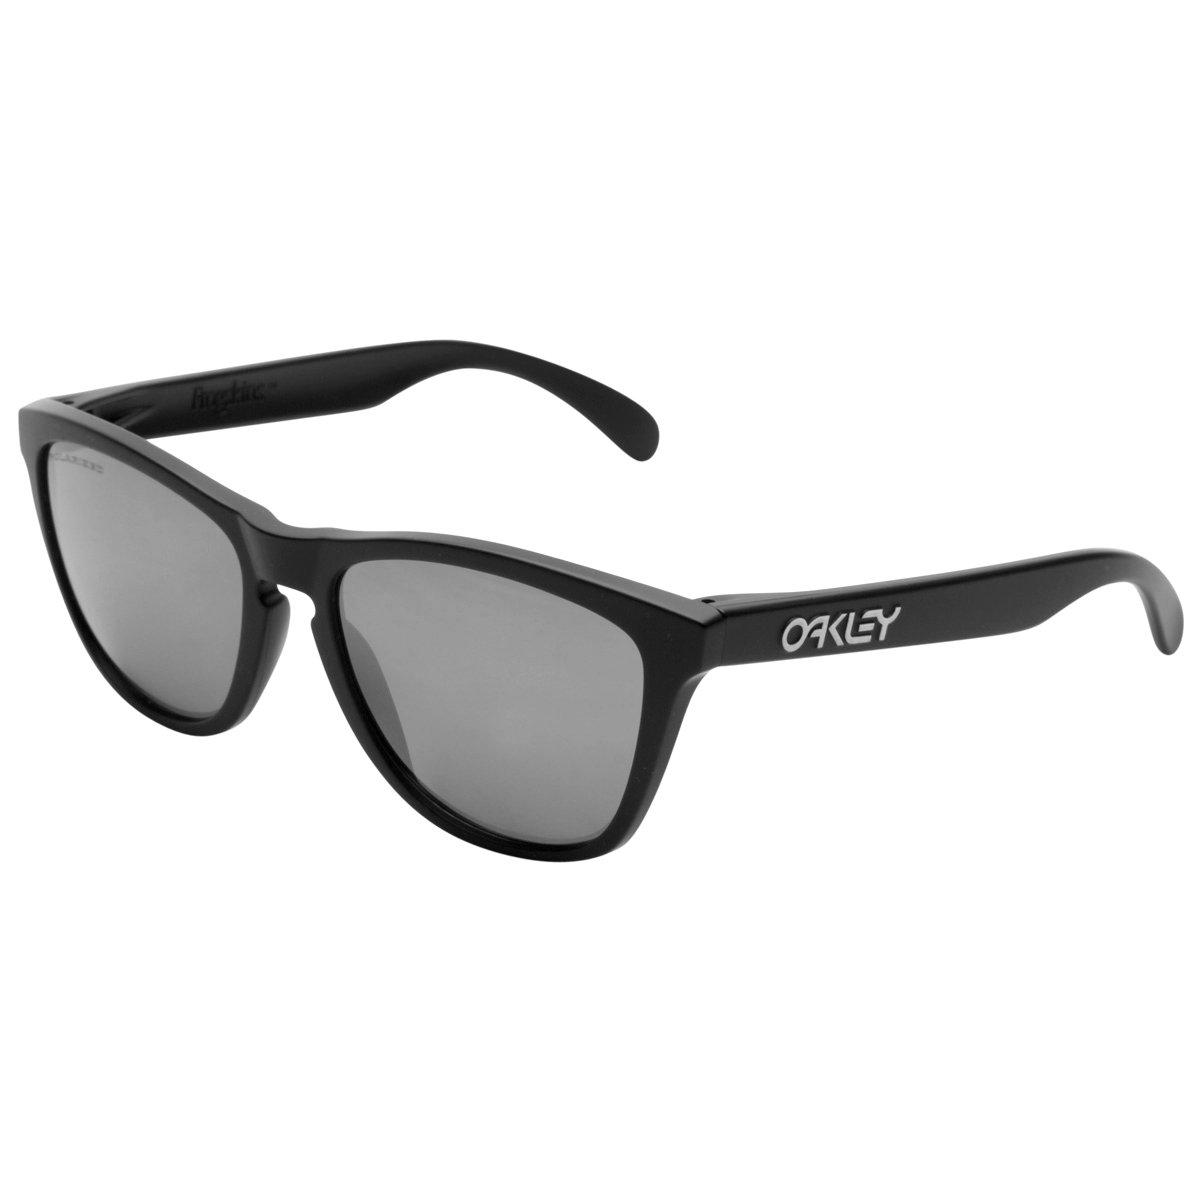 36fb16d5702ec Óculos Oakley Frogskins - Iridium Polarizado - Compre Agora